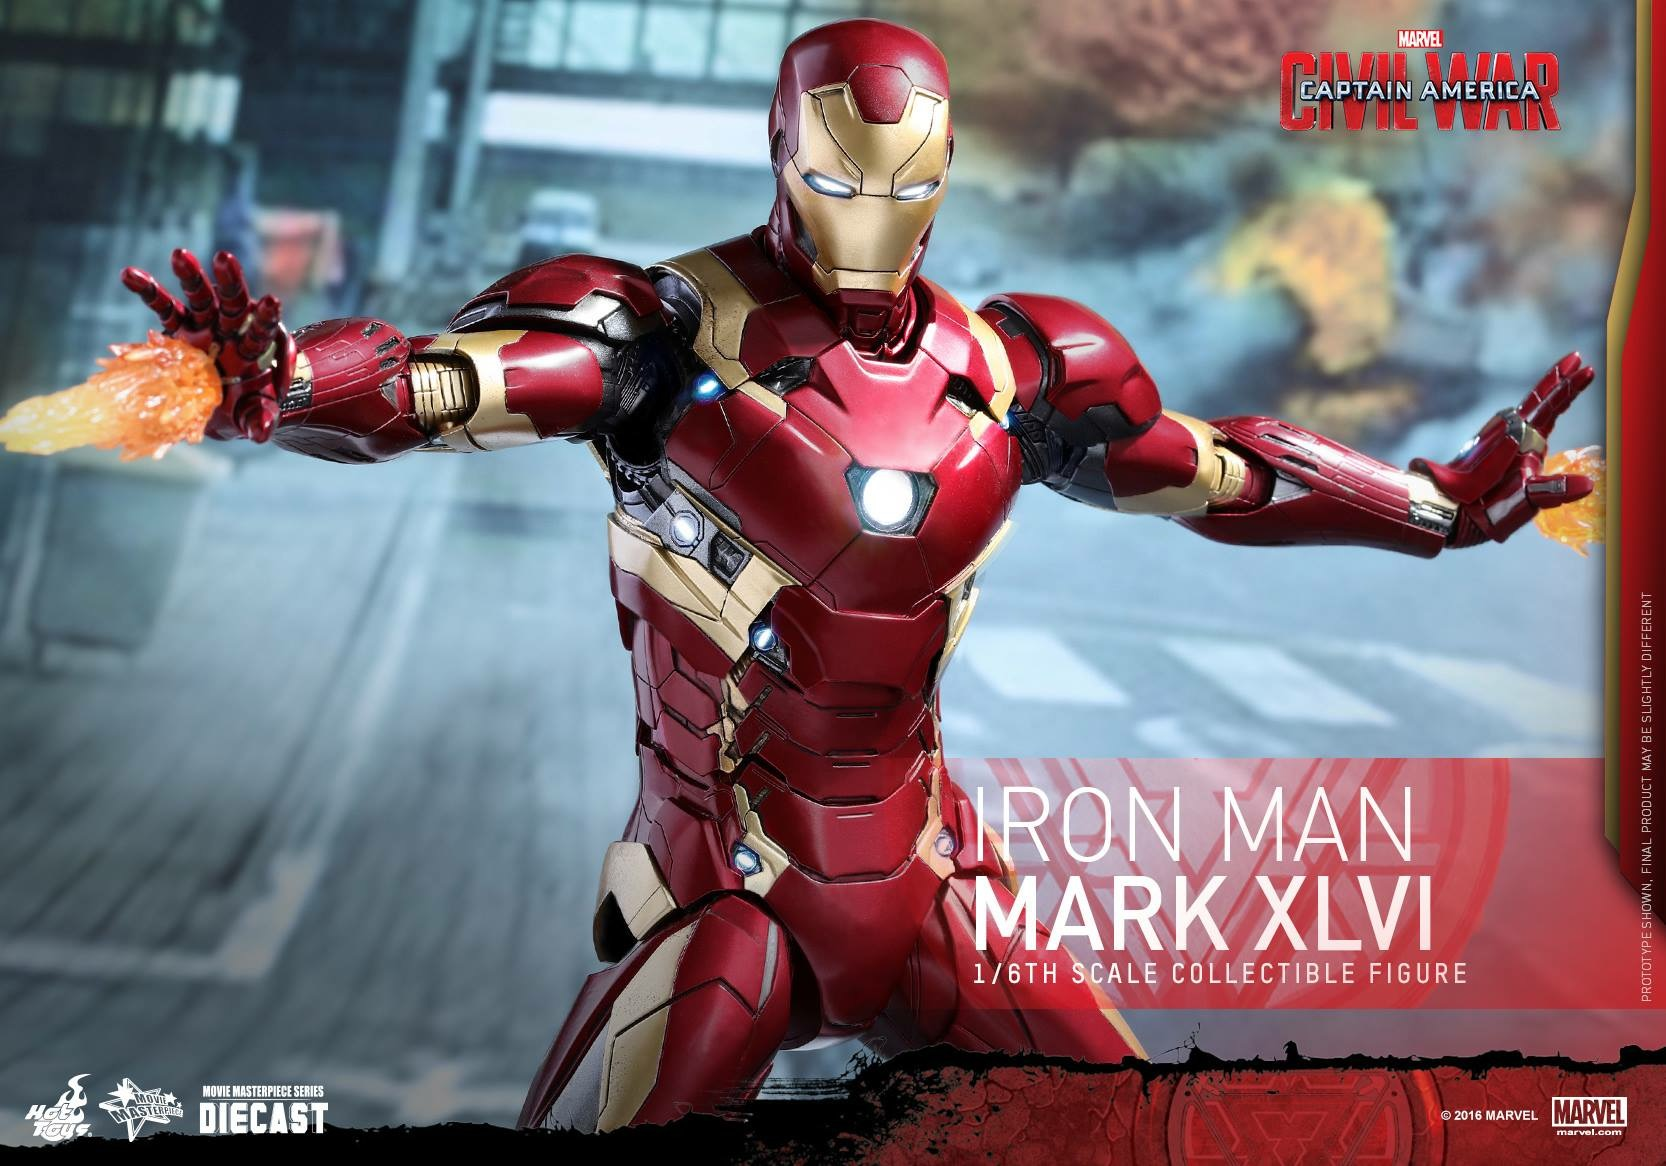 CAPTAIN AMERICA : CIVIL WAR - IRON MAN MARK XLVI (MMS353DC16) 160419024026331627